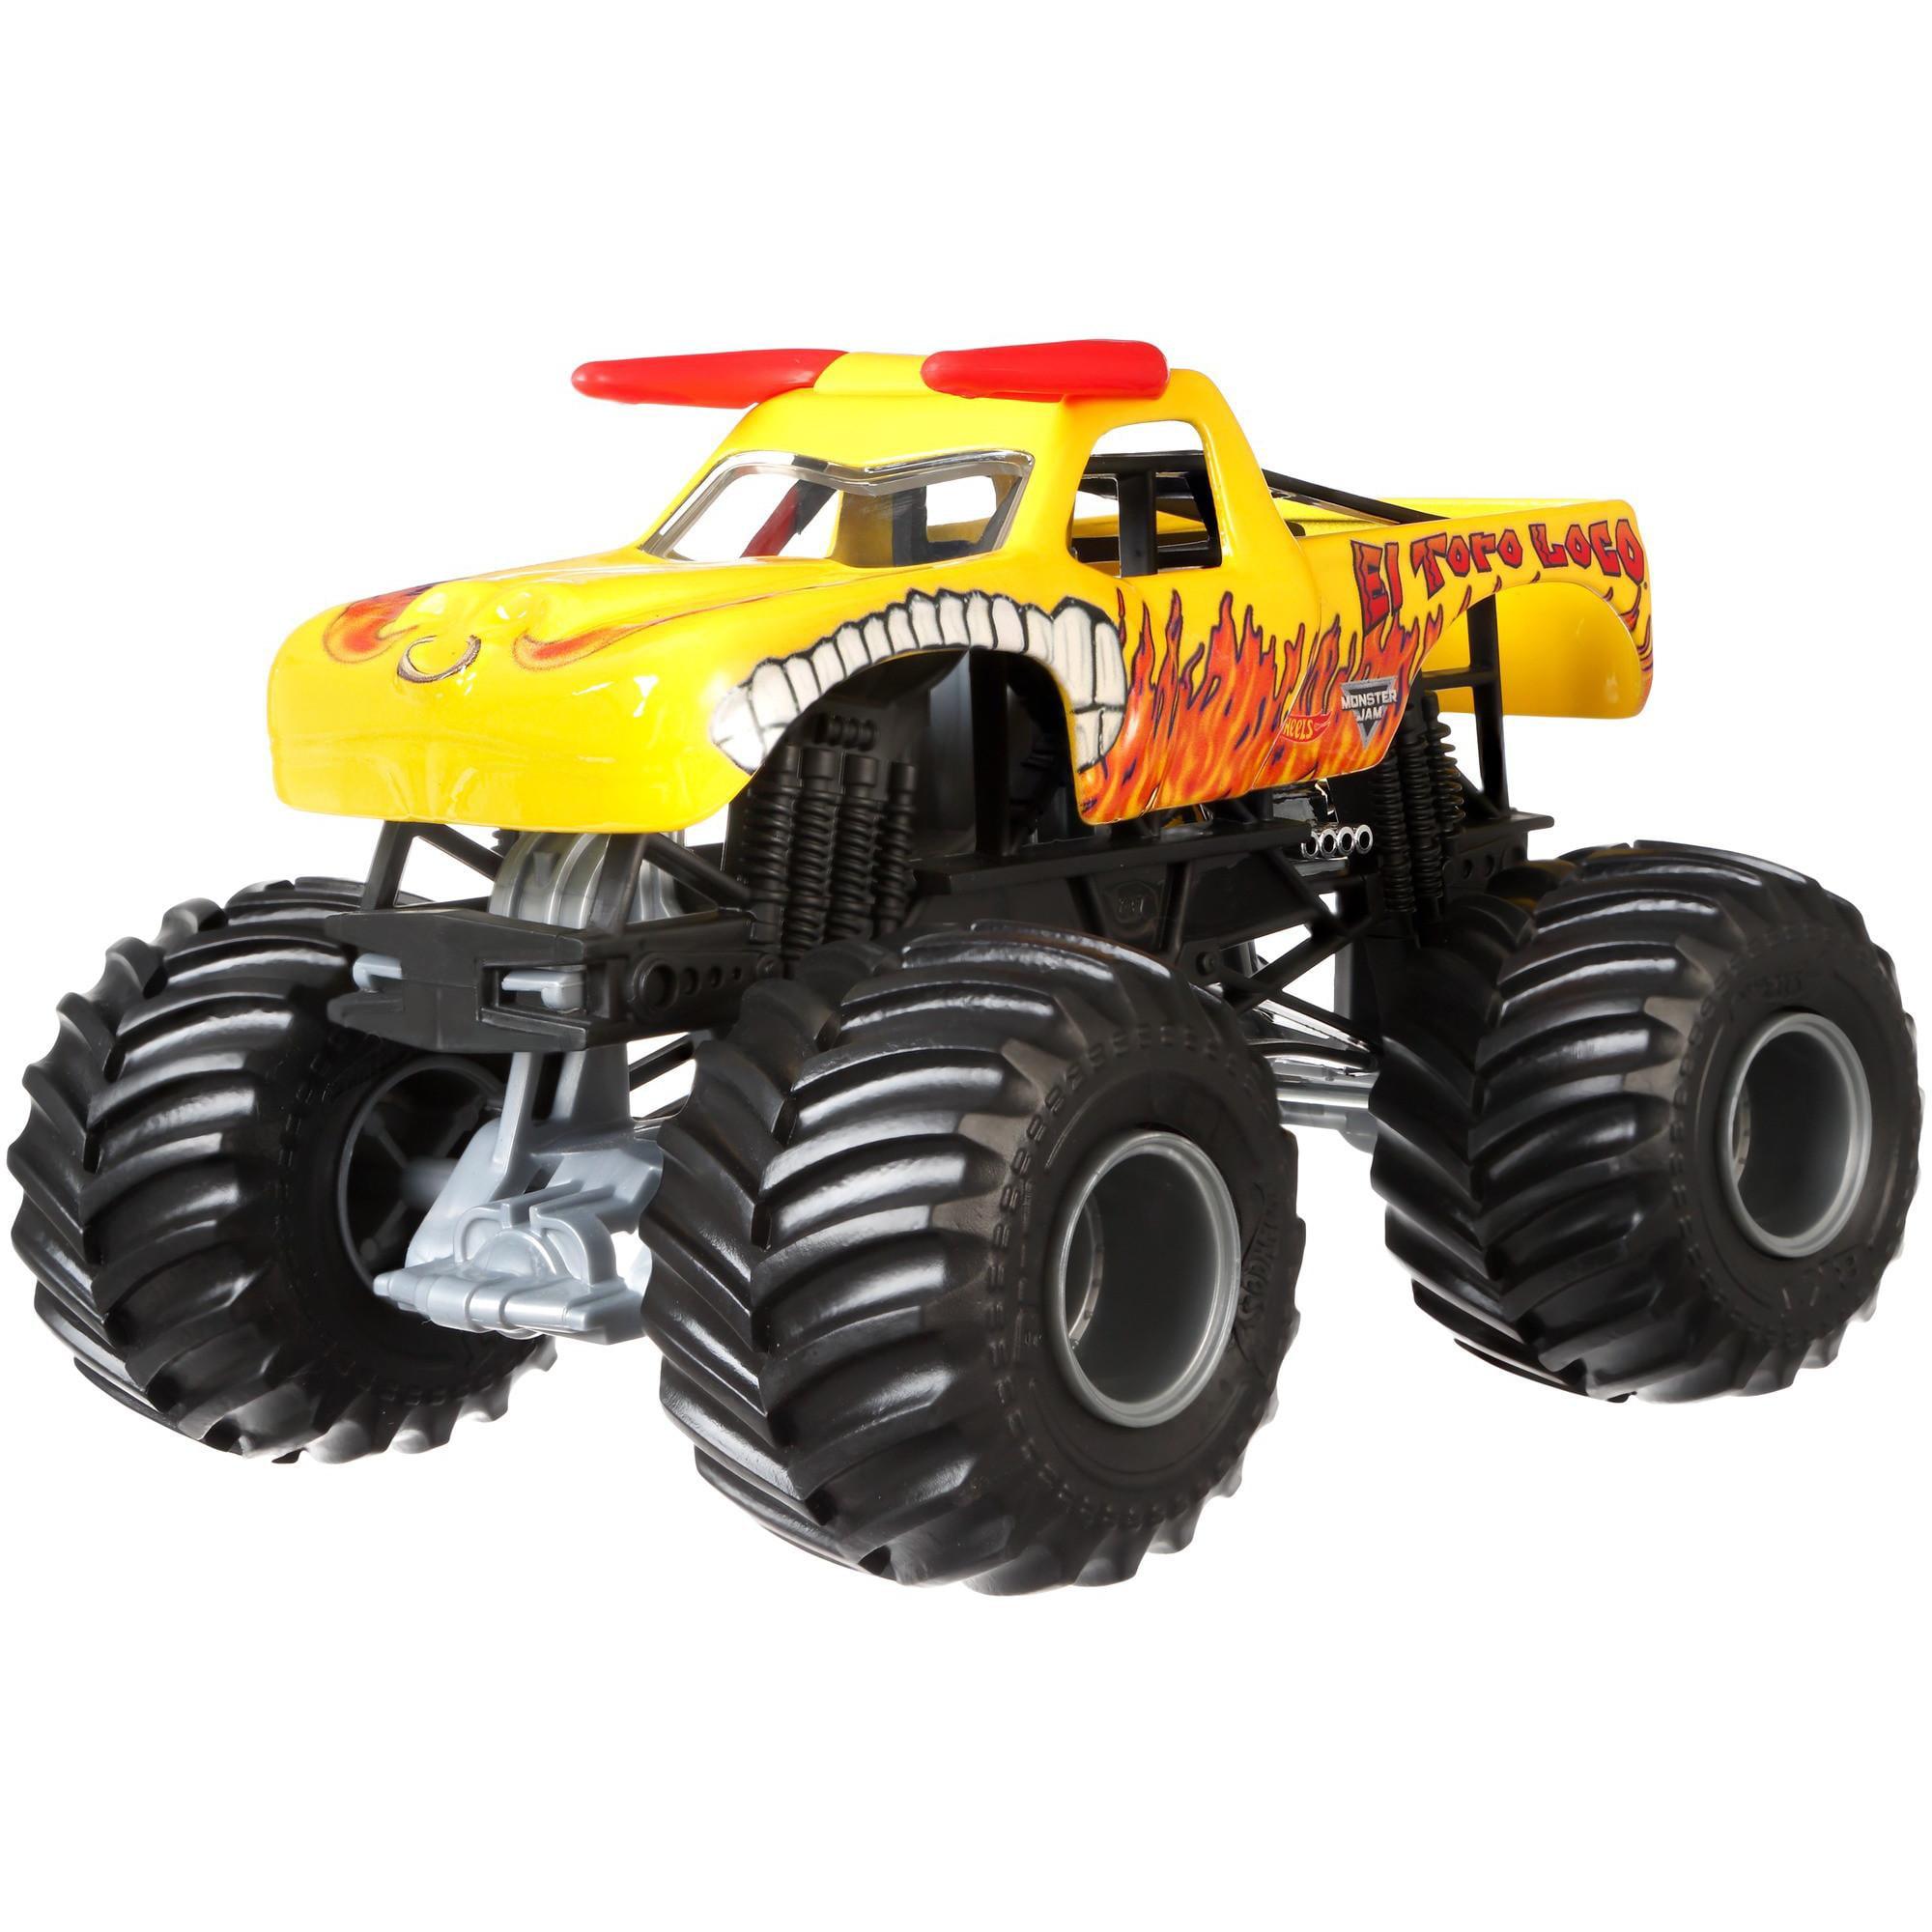 Hot Wheels Monster Jam 1:24 Scale El Toro Loco Vehicle, Yellow by Mattel